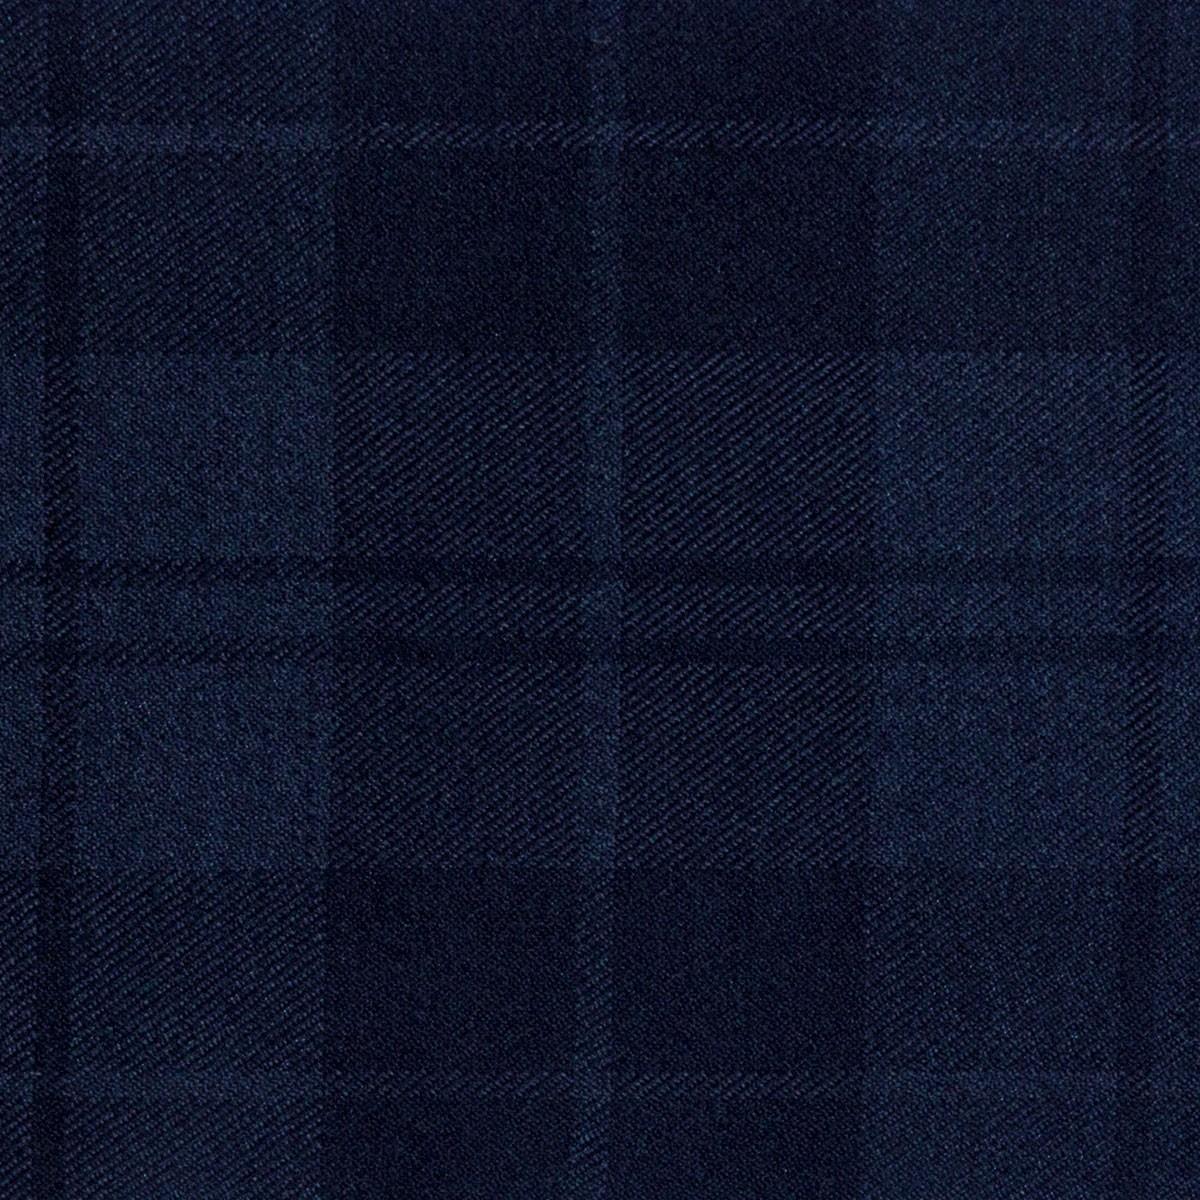 Douglas Dark Navy Light Weight Tartan Fabric